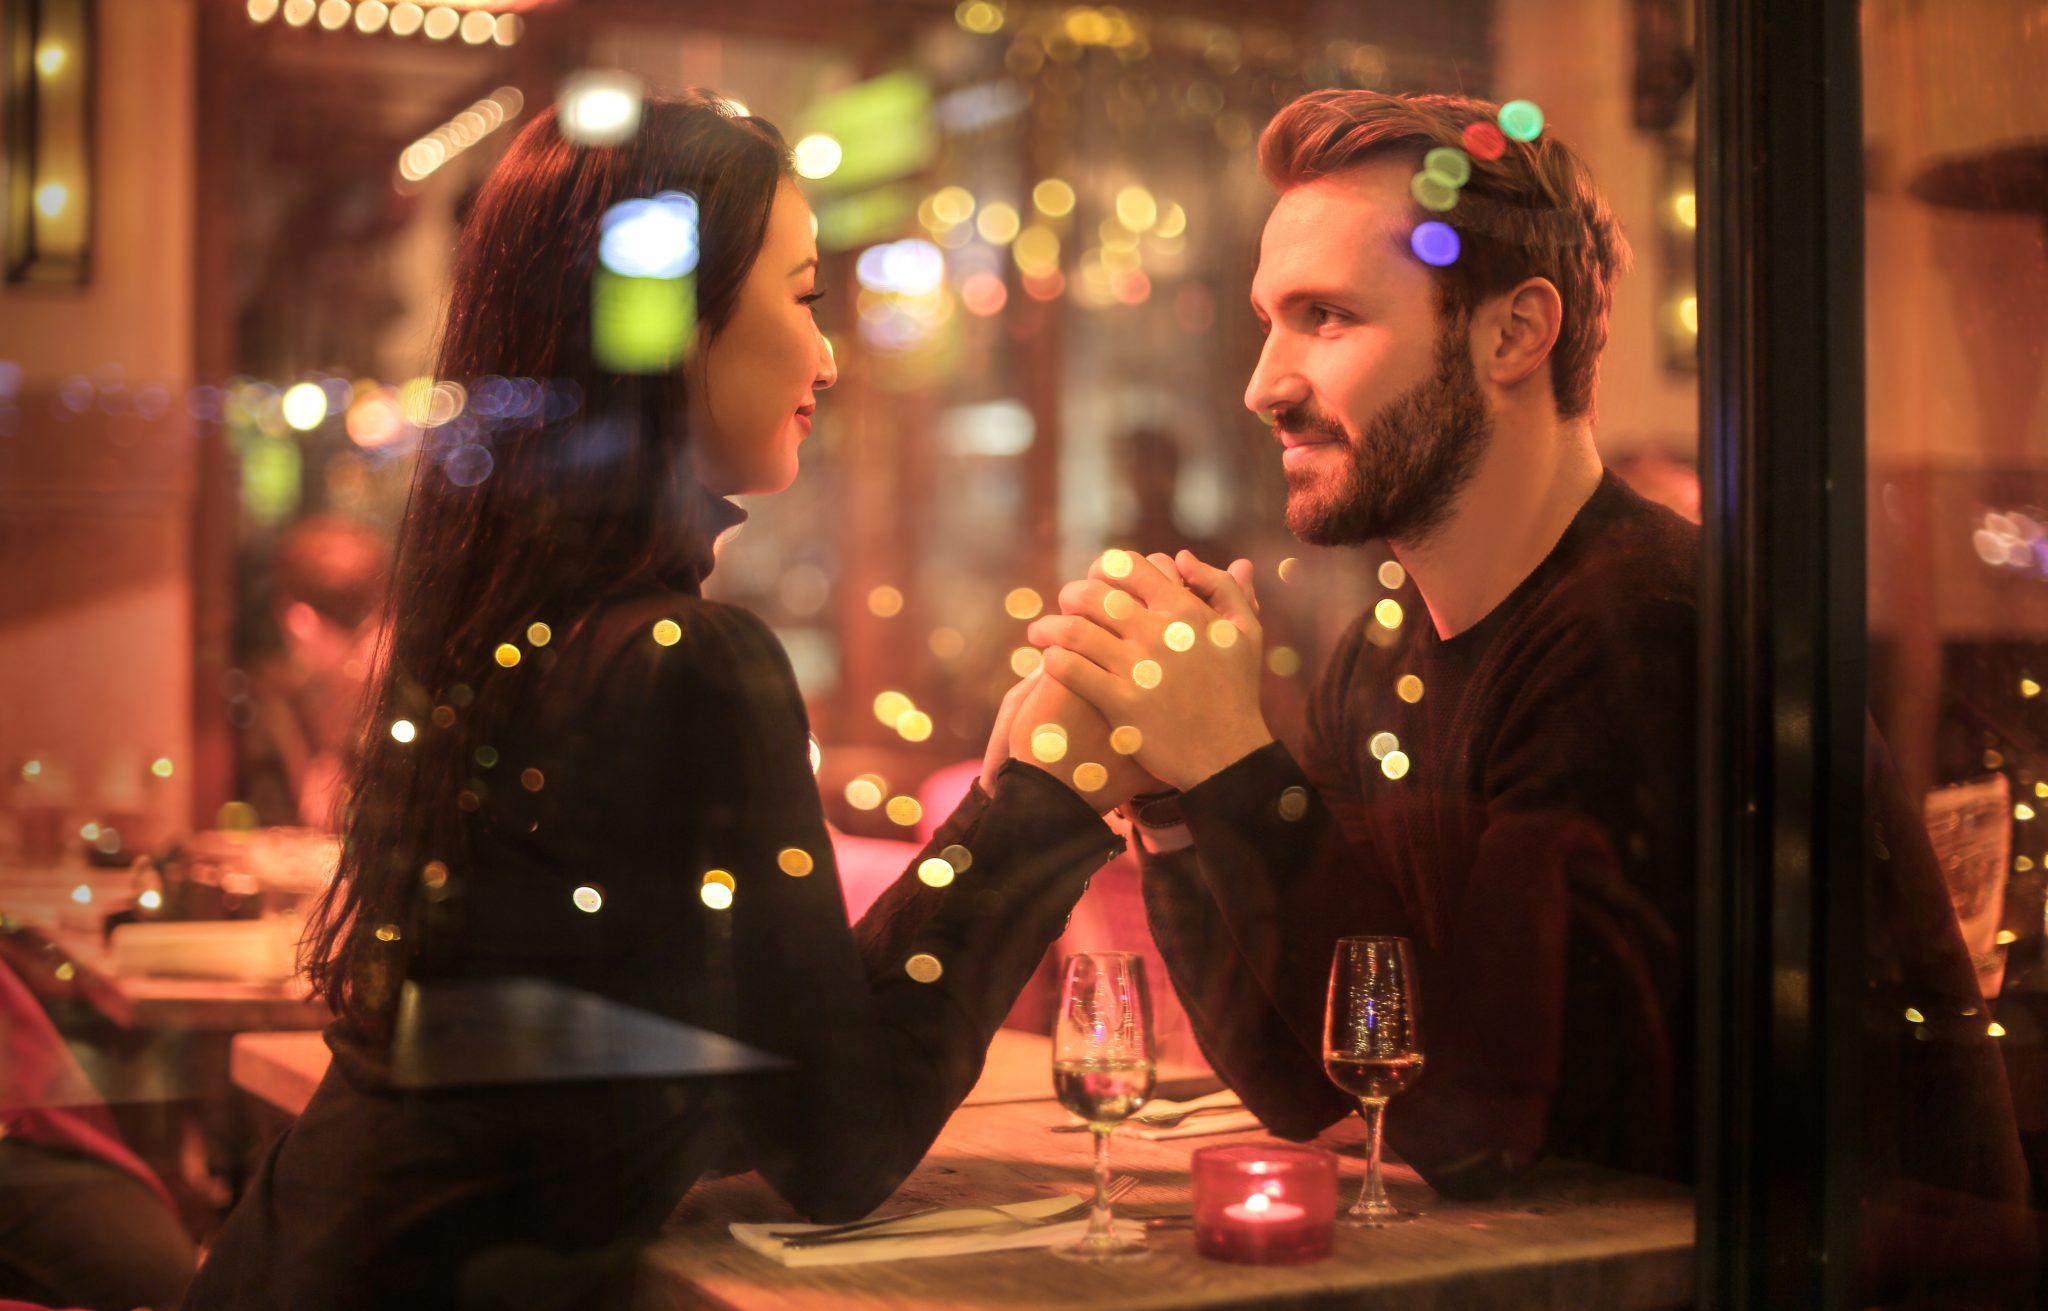 biracial cytaty randkowe